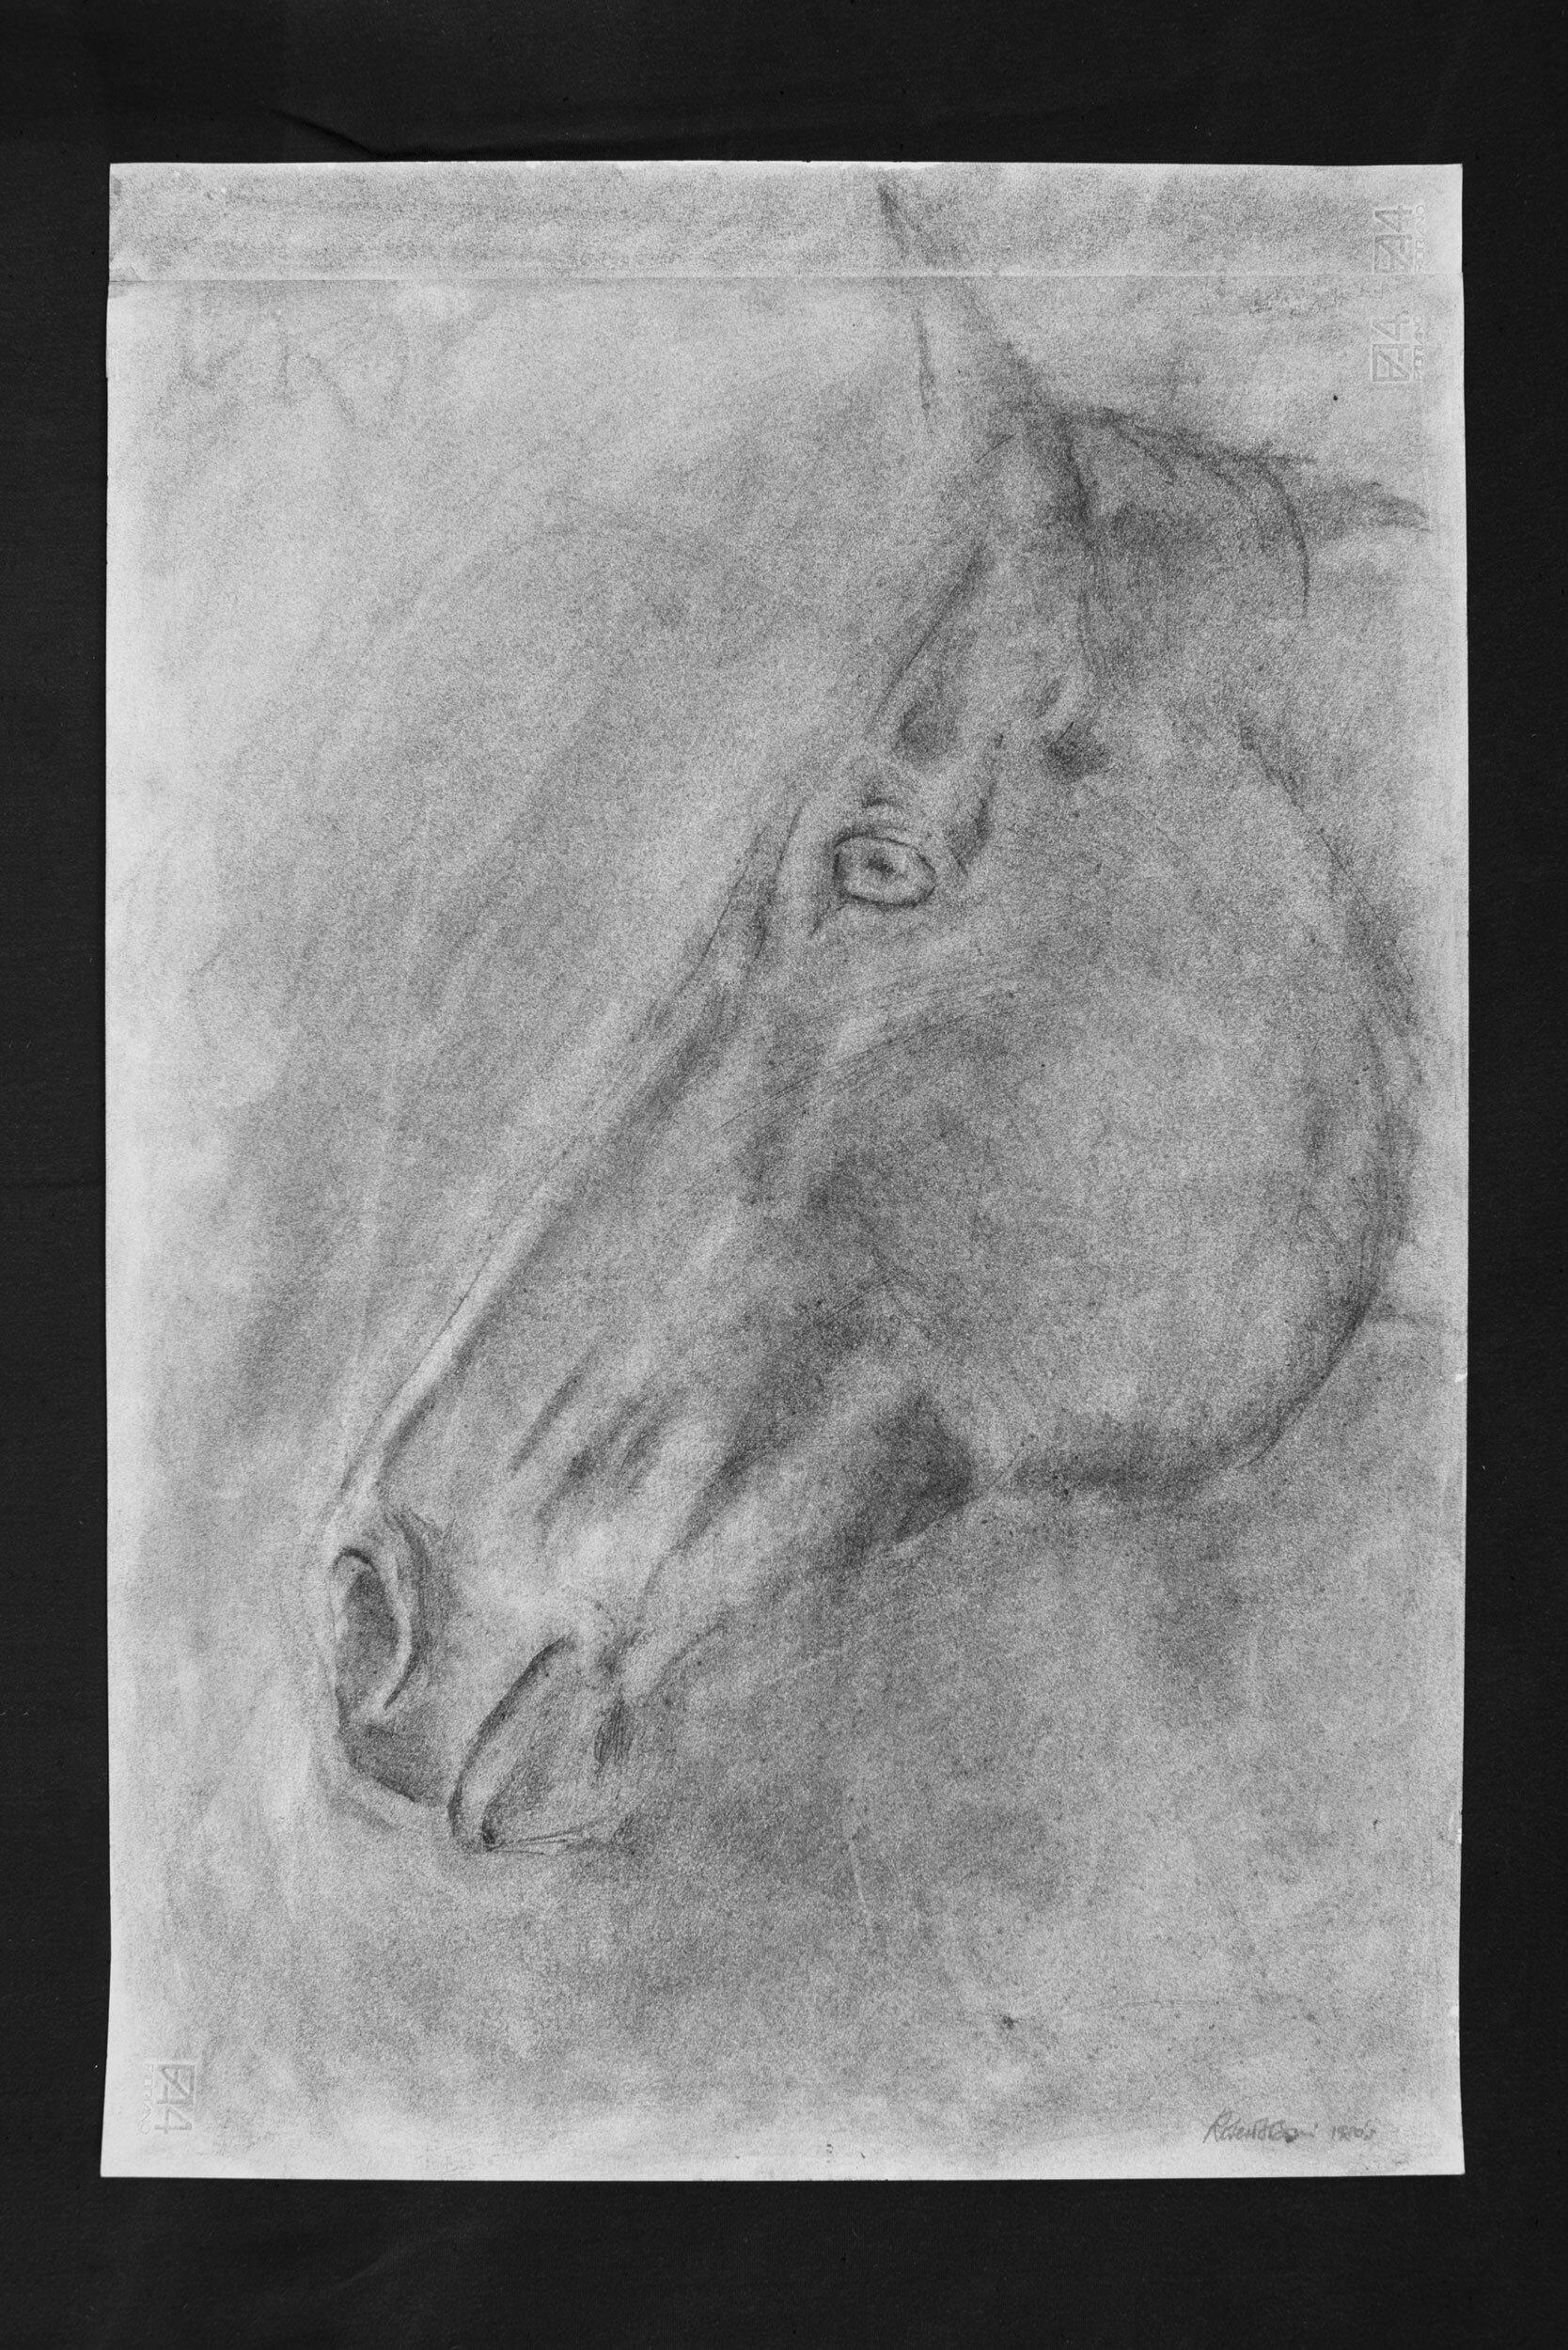 Horse #05